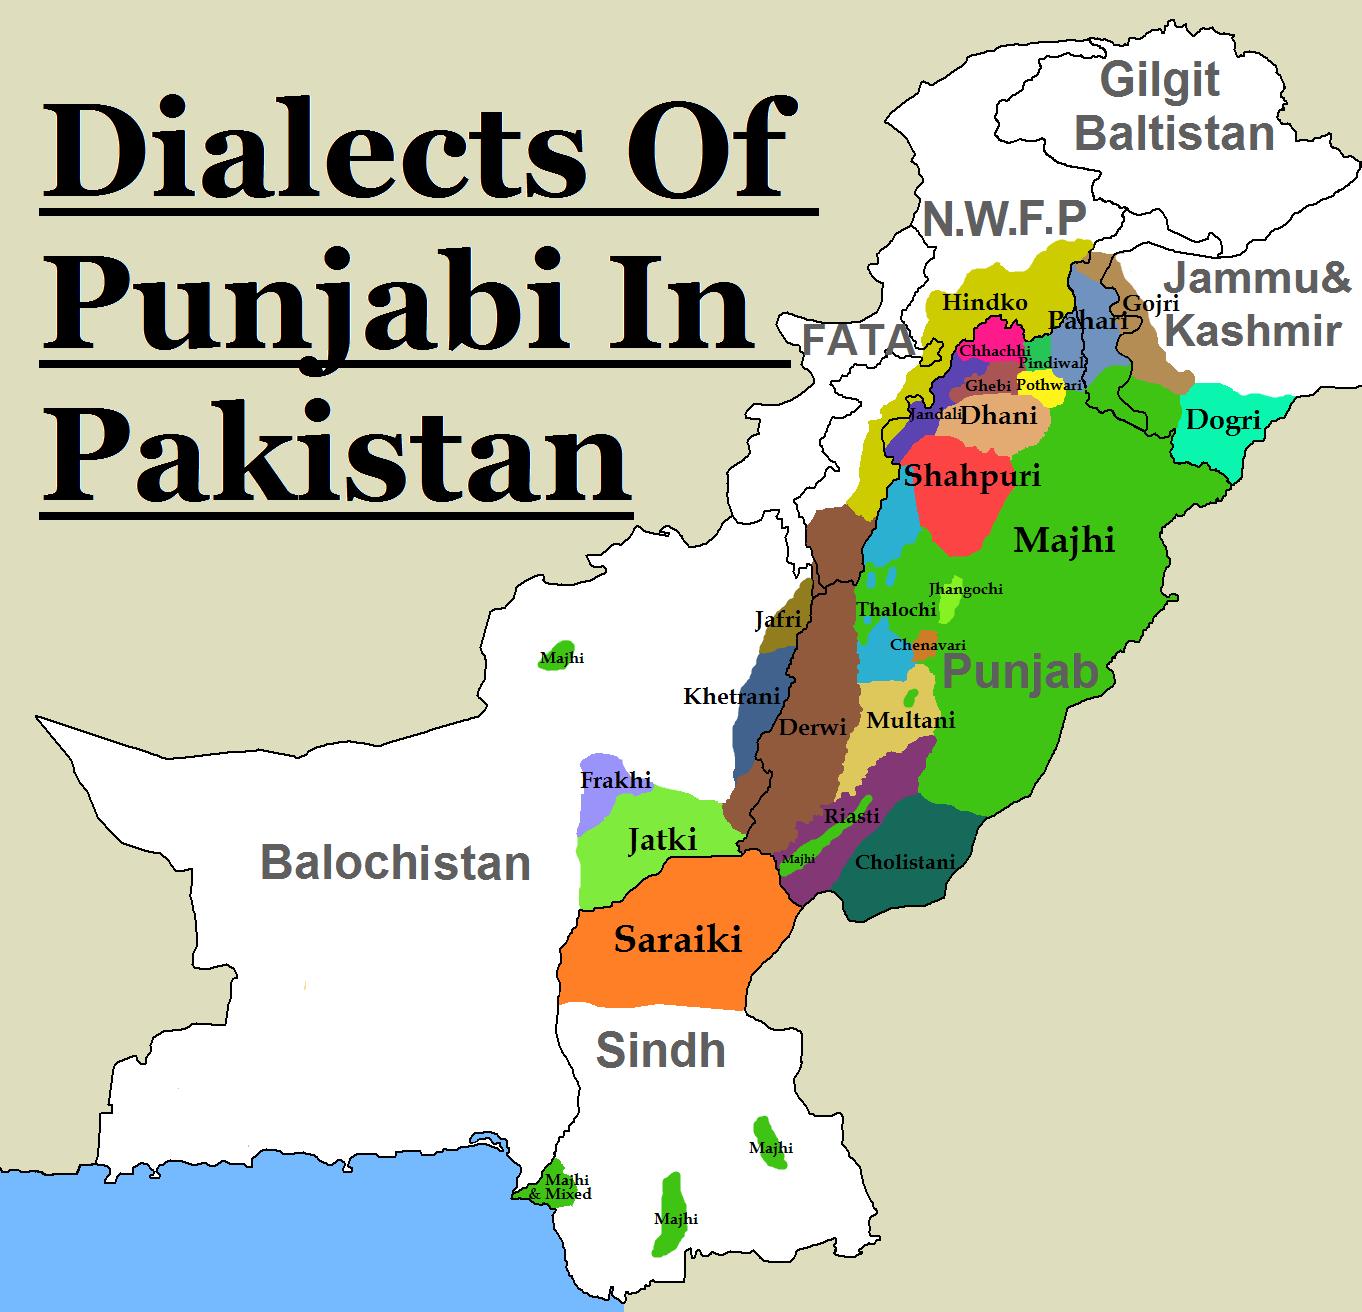 foto de File:Pakistan Punjabi Dialects PNG Wikimedia Commons